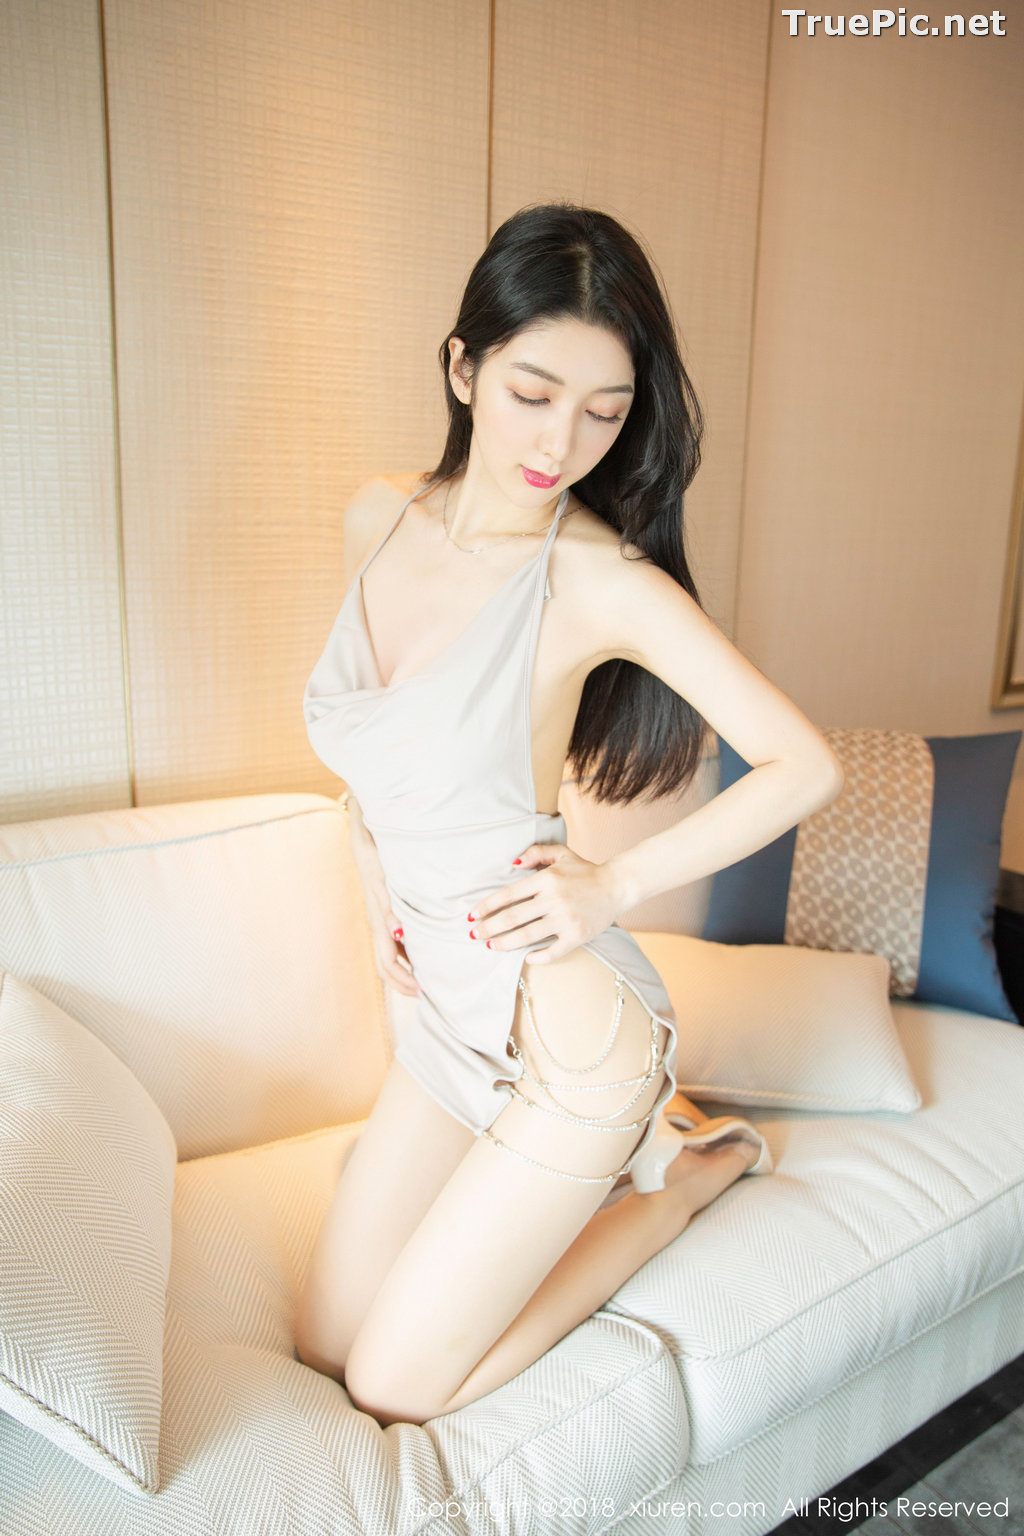 Image XIUREN No.1141 - Chinese Model - Xiao Reba (Angela小热巴) - Sexy Dress Tonight - TruePic.net - Picture-22